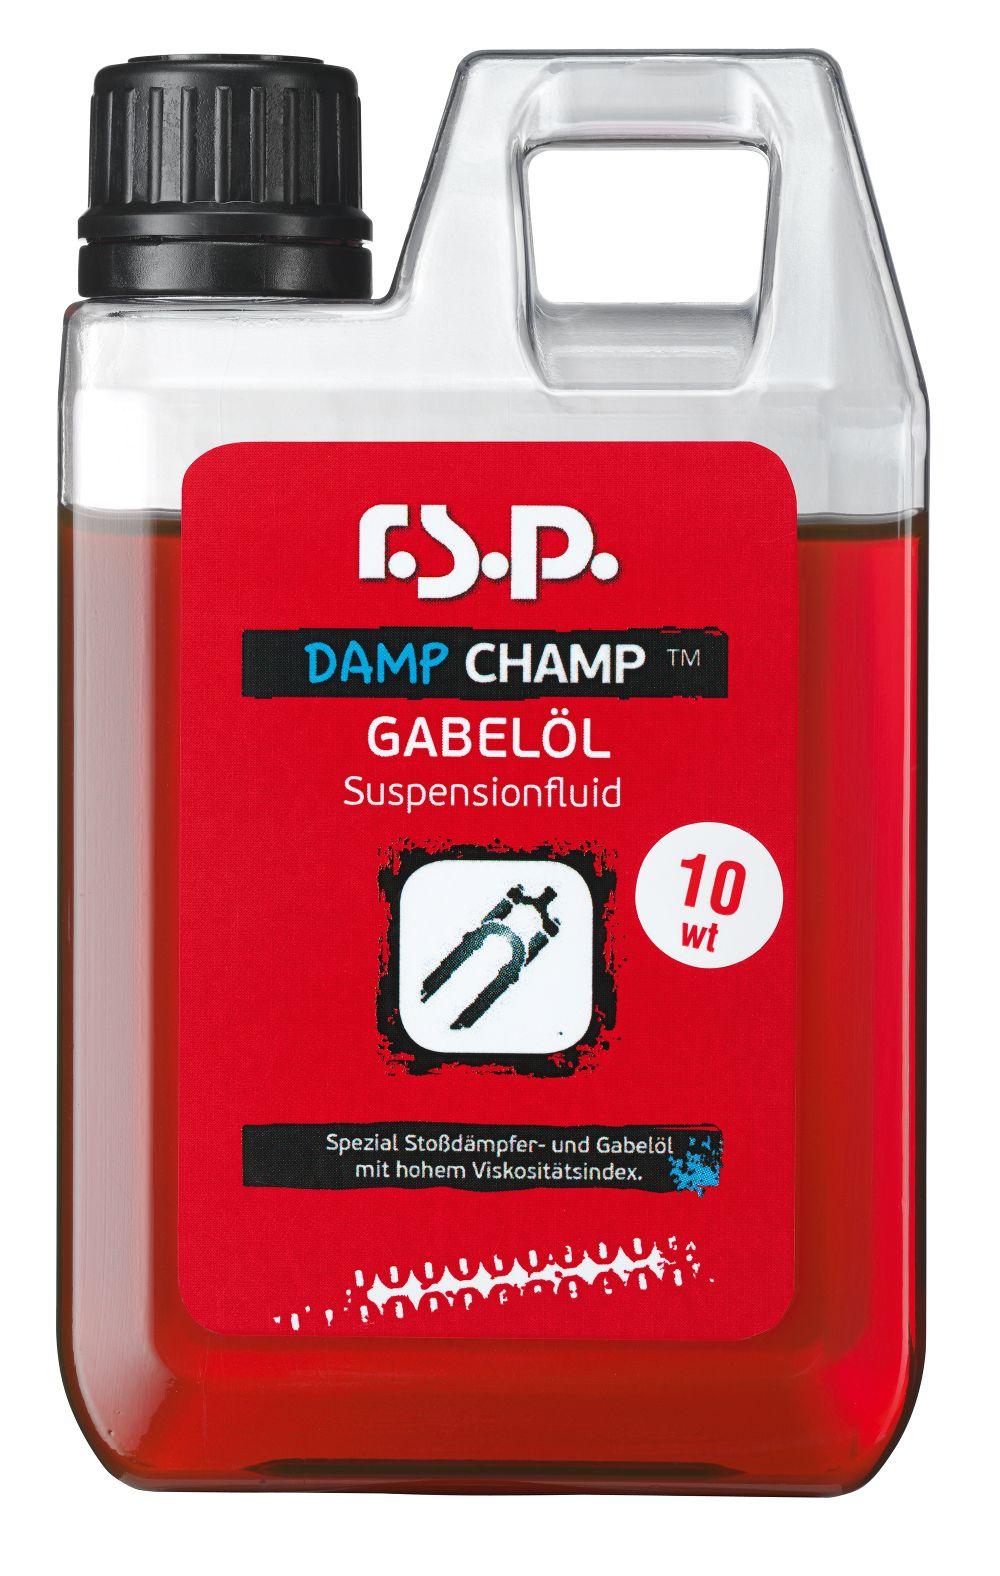 Huile fourche r.s.p. Damp Champ 10wt 1 L